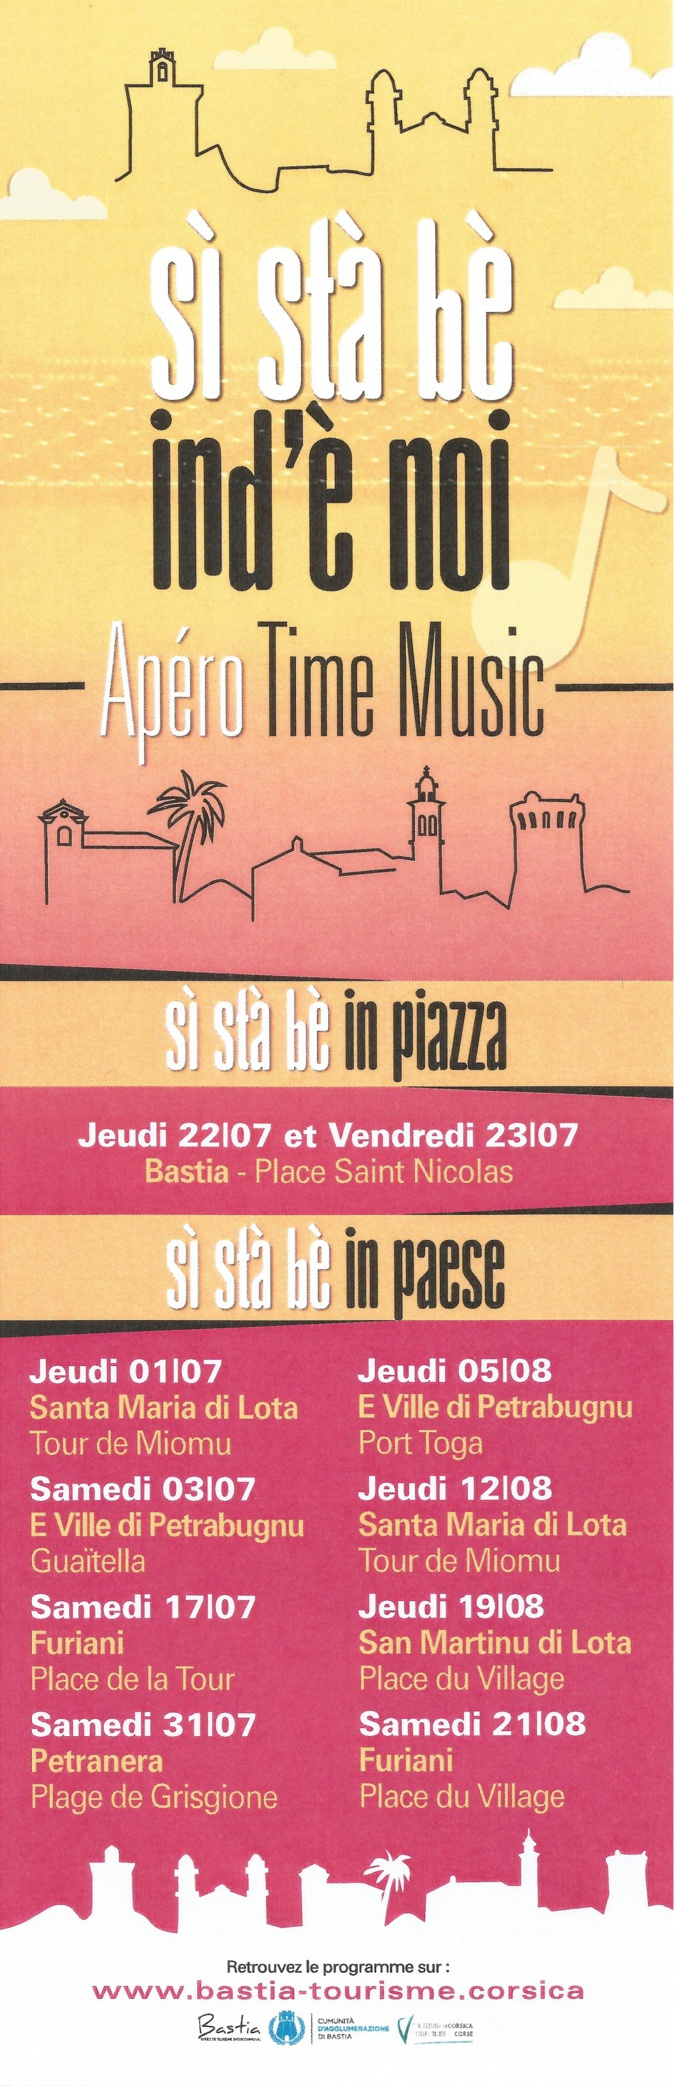 Programme des Apéros Time Music